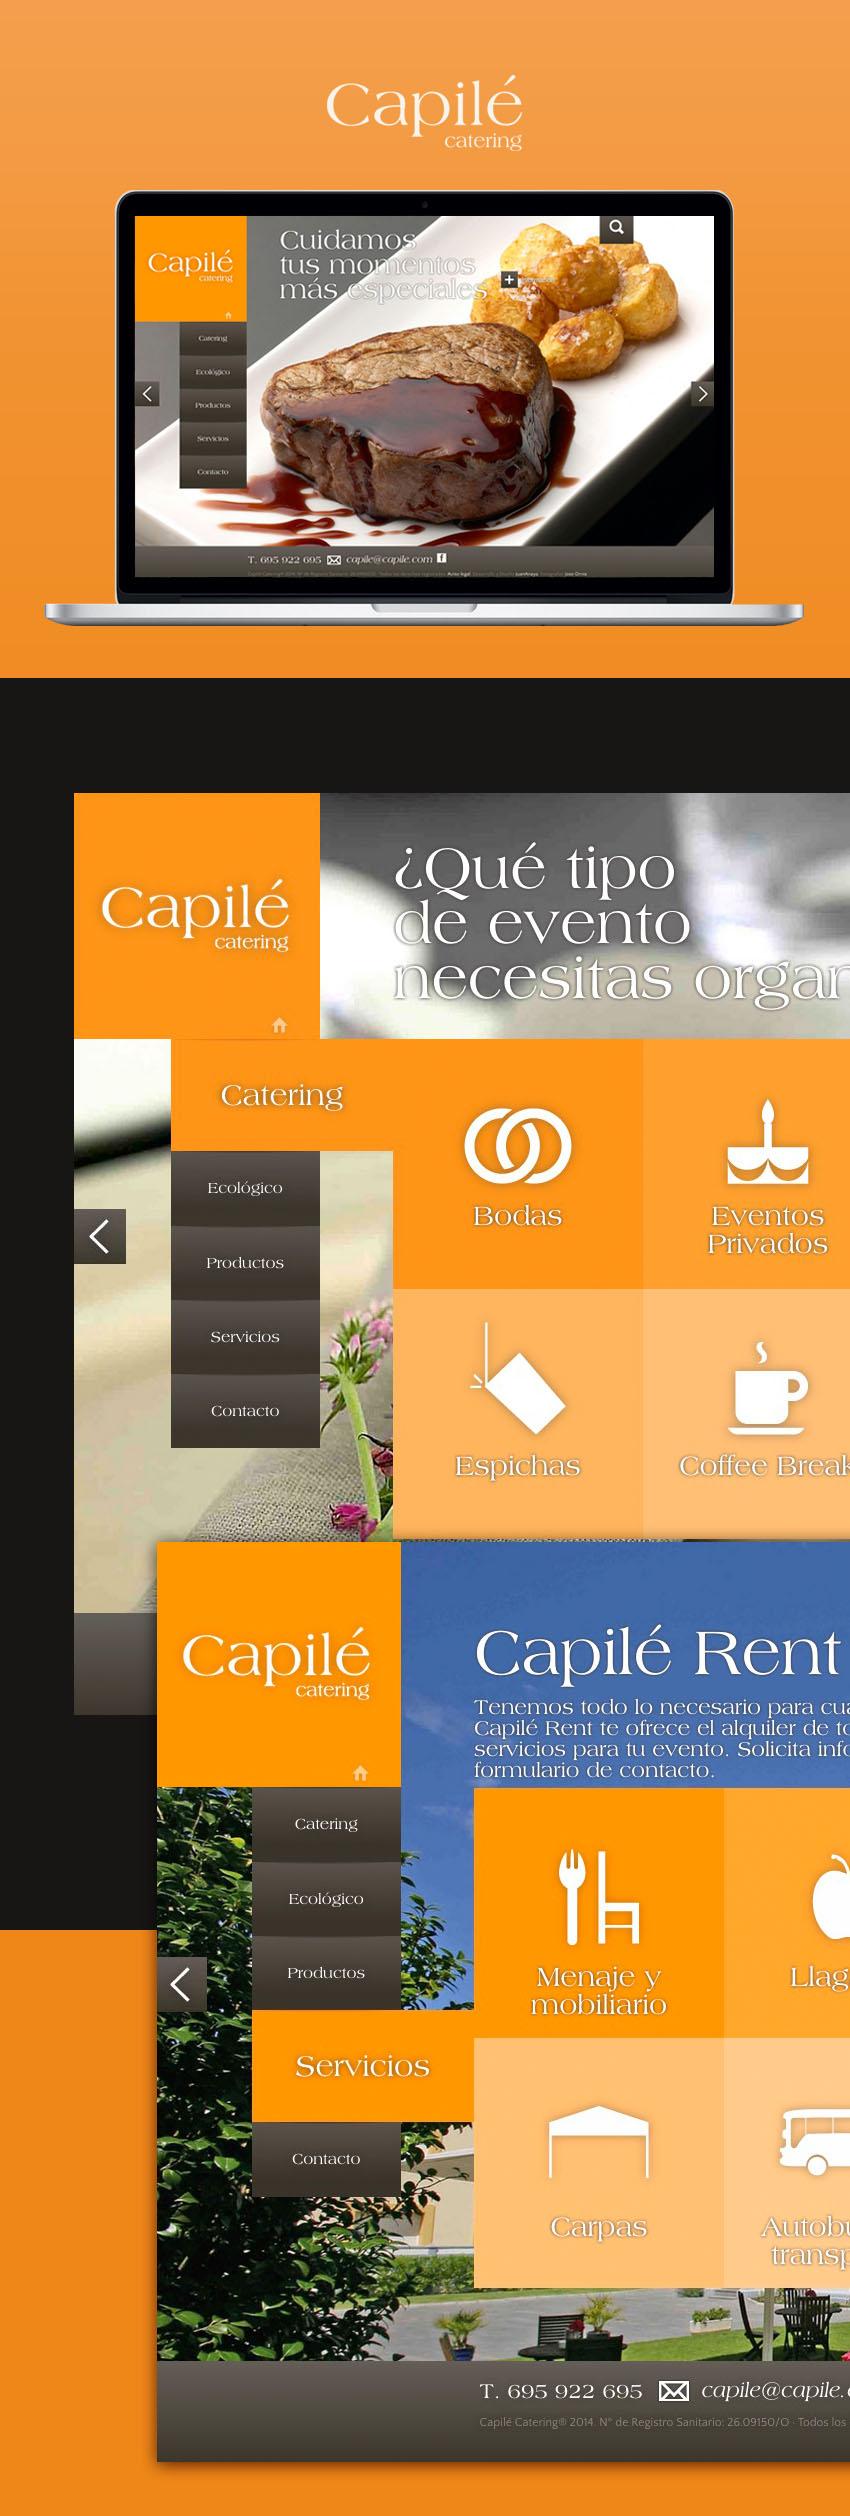 capile_web_01